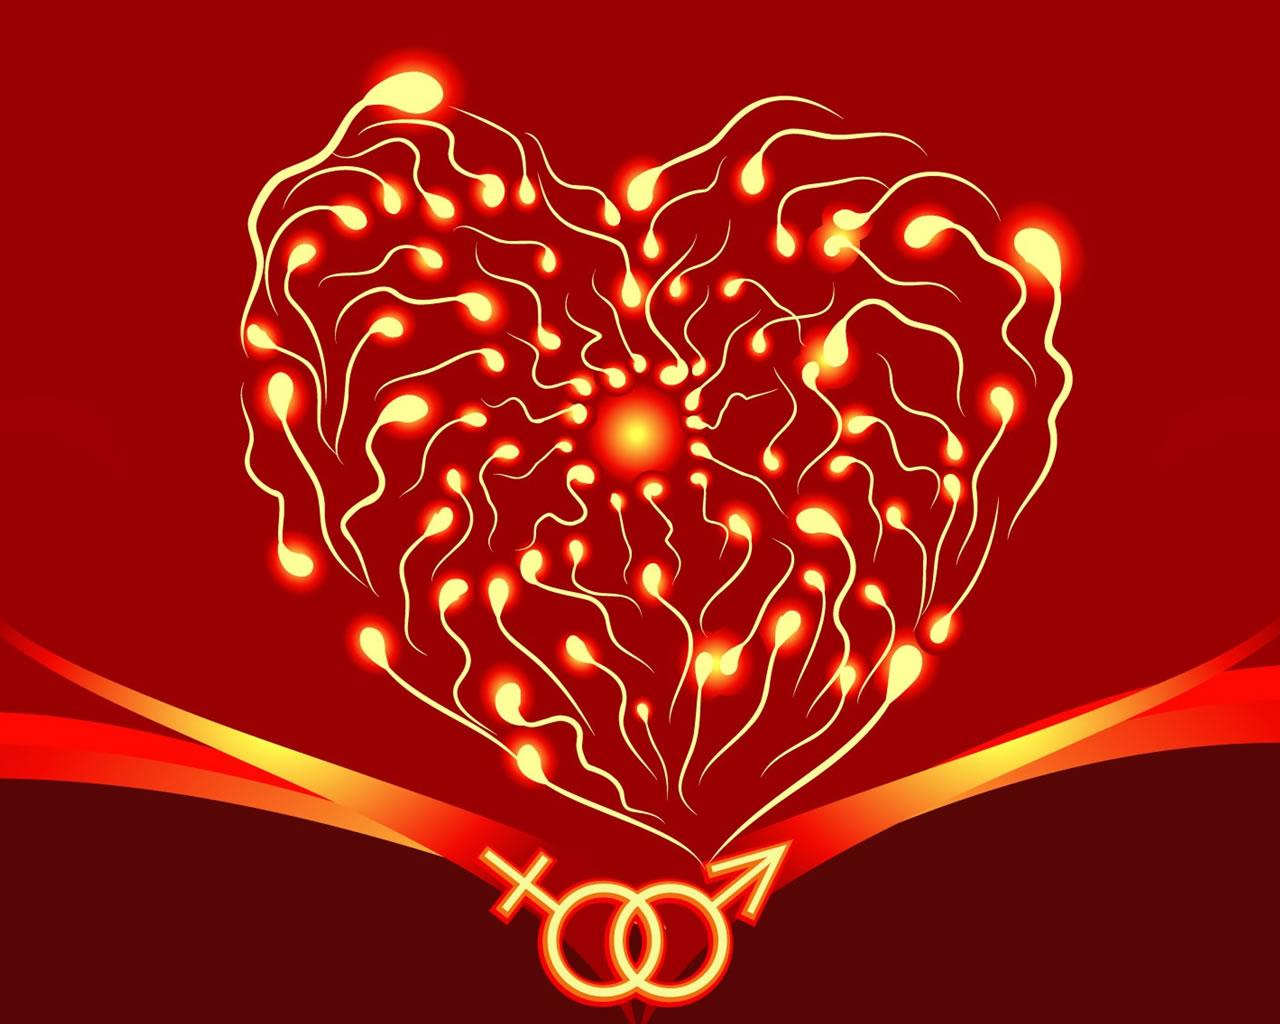 Marcos gratis para fotos wallpaper amor y amistad san - San valentin desktop backgrounds ...